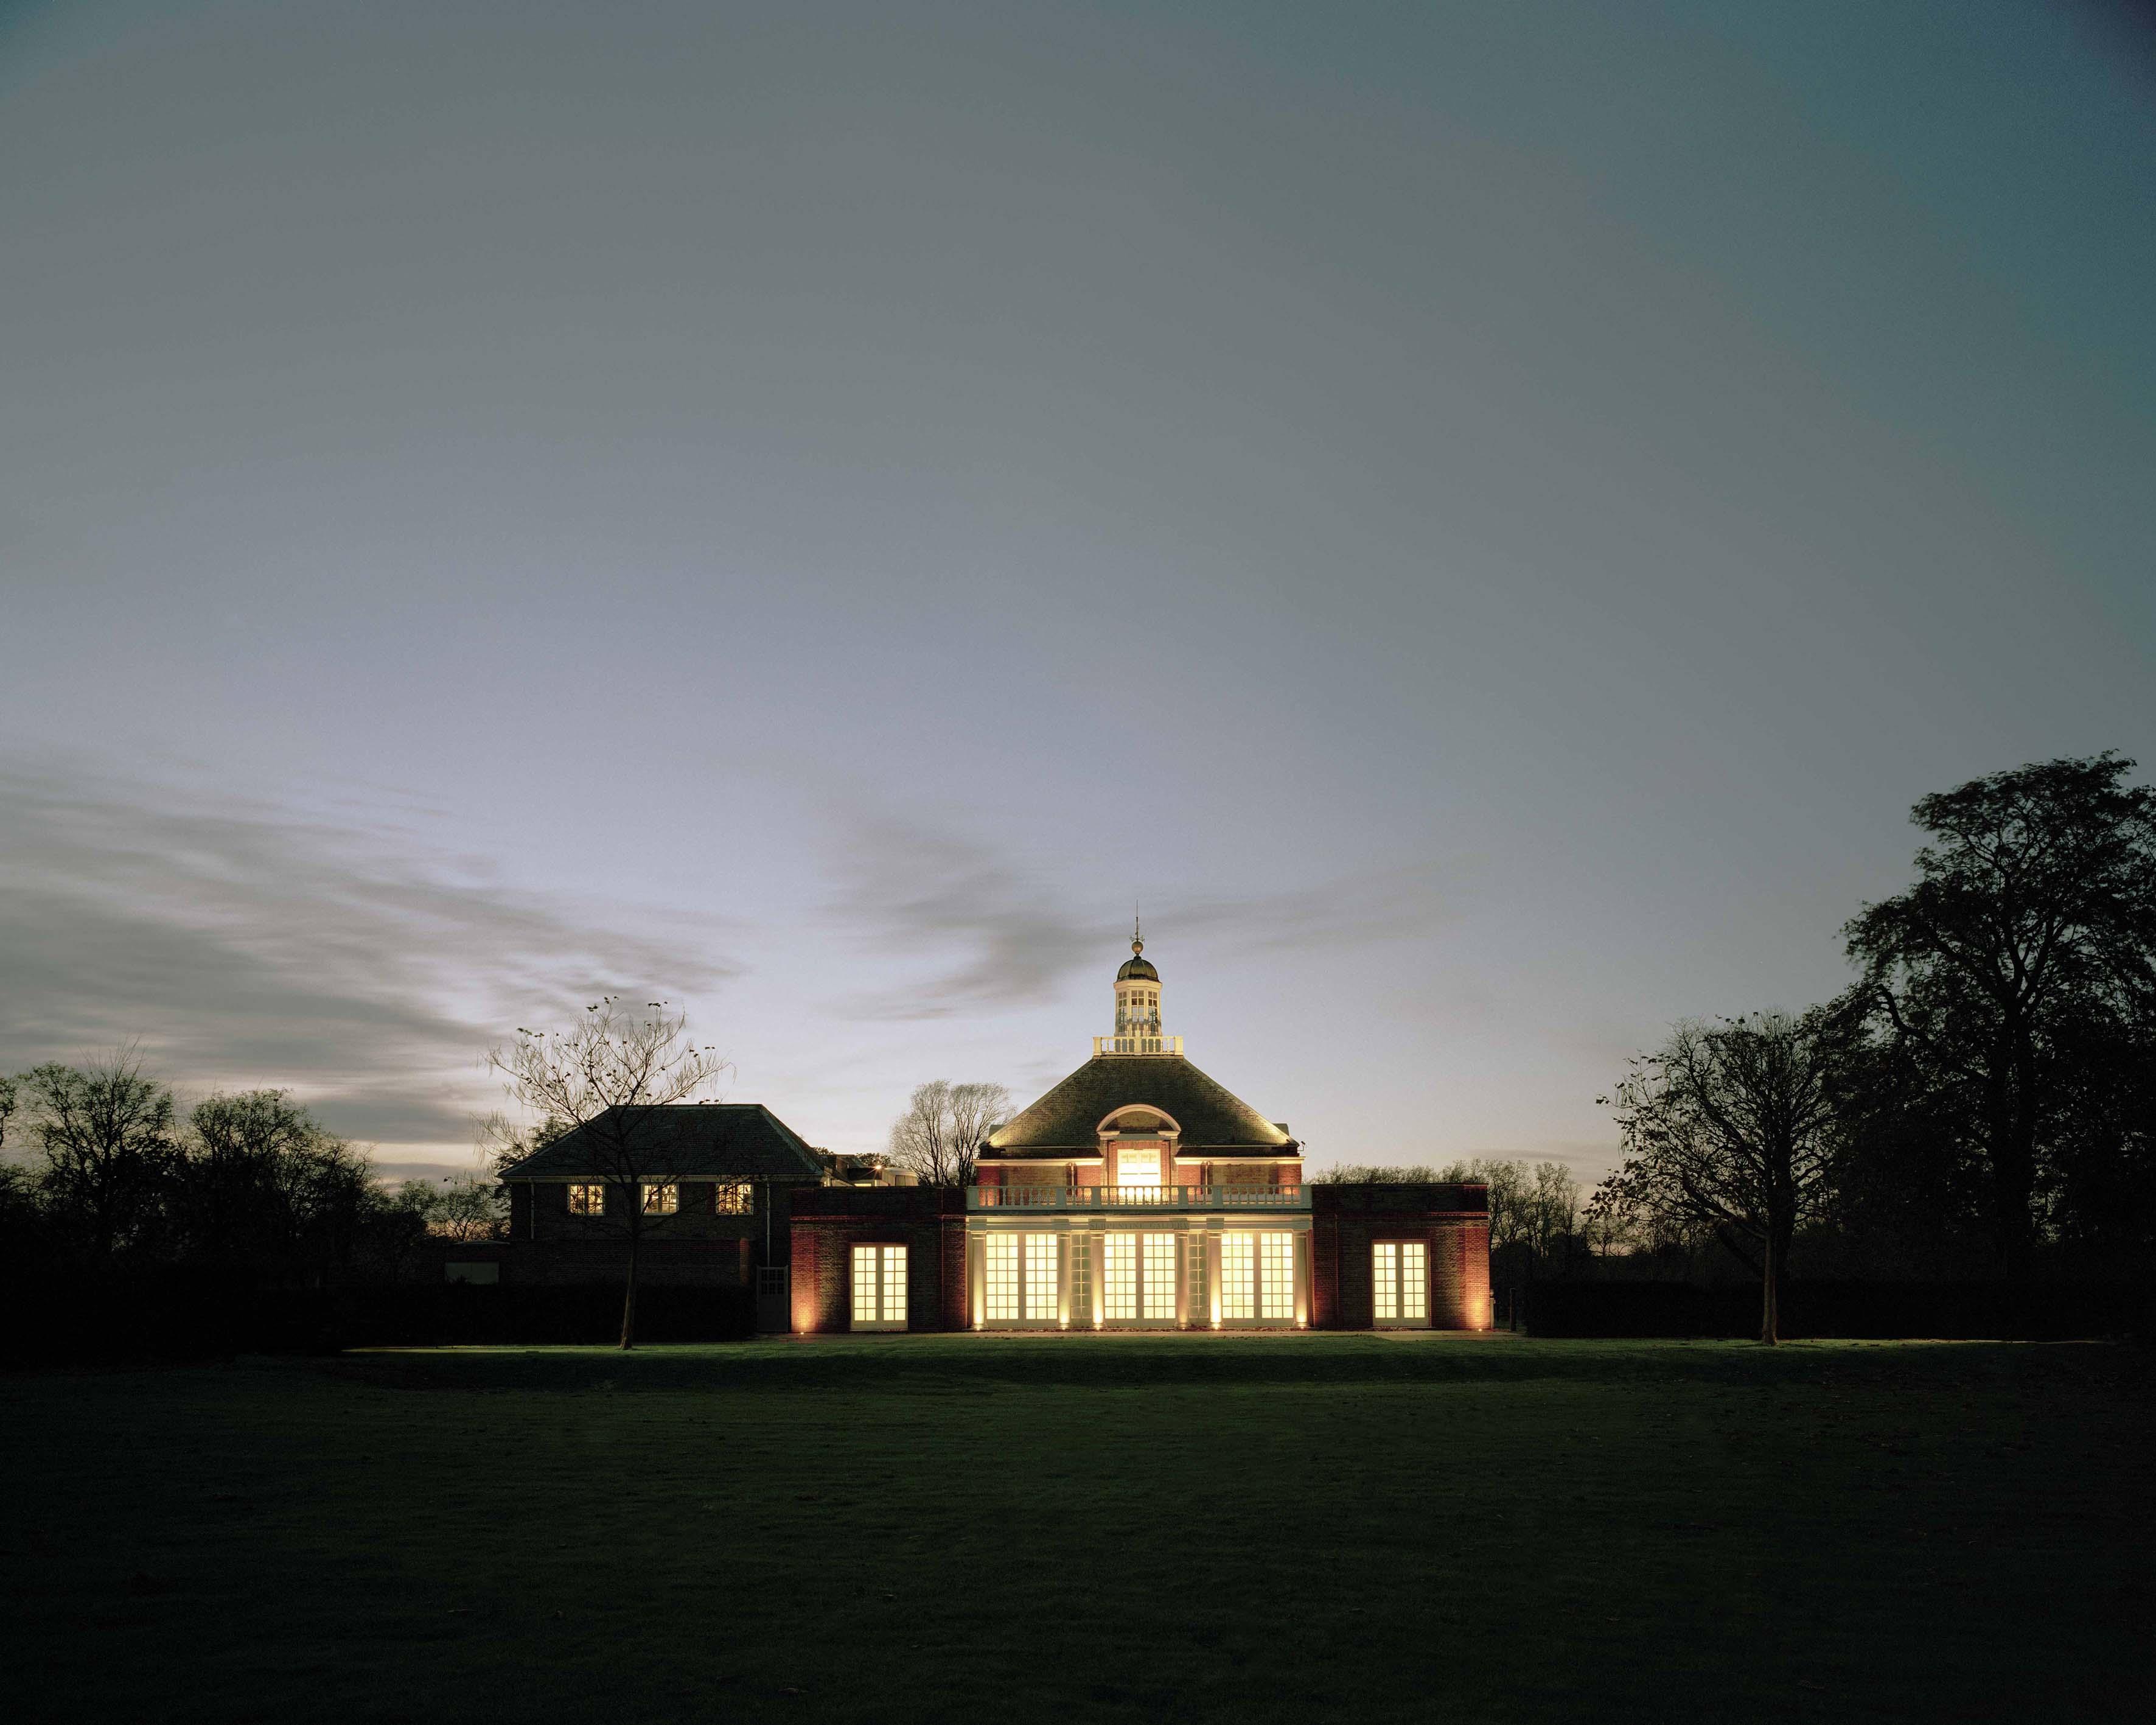 Fachada da Serpentine Gallery, em Londres (Foto: John Offenbach, Serpentine Gallery)